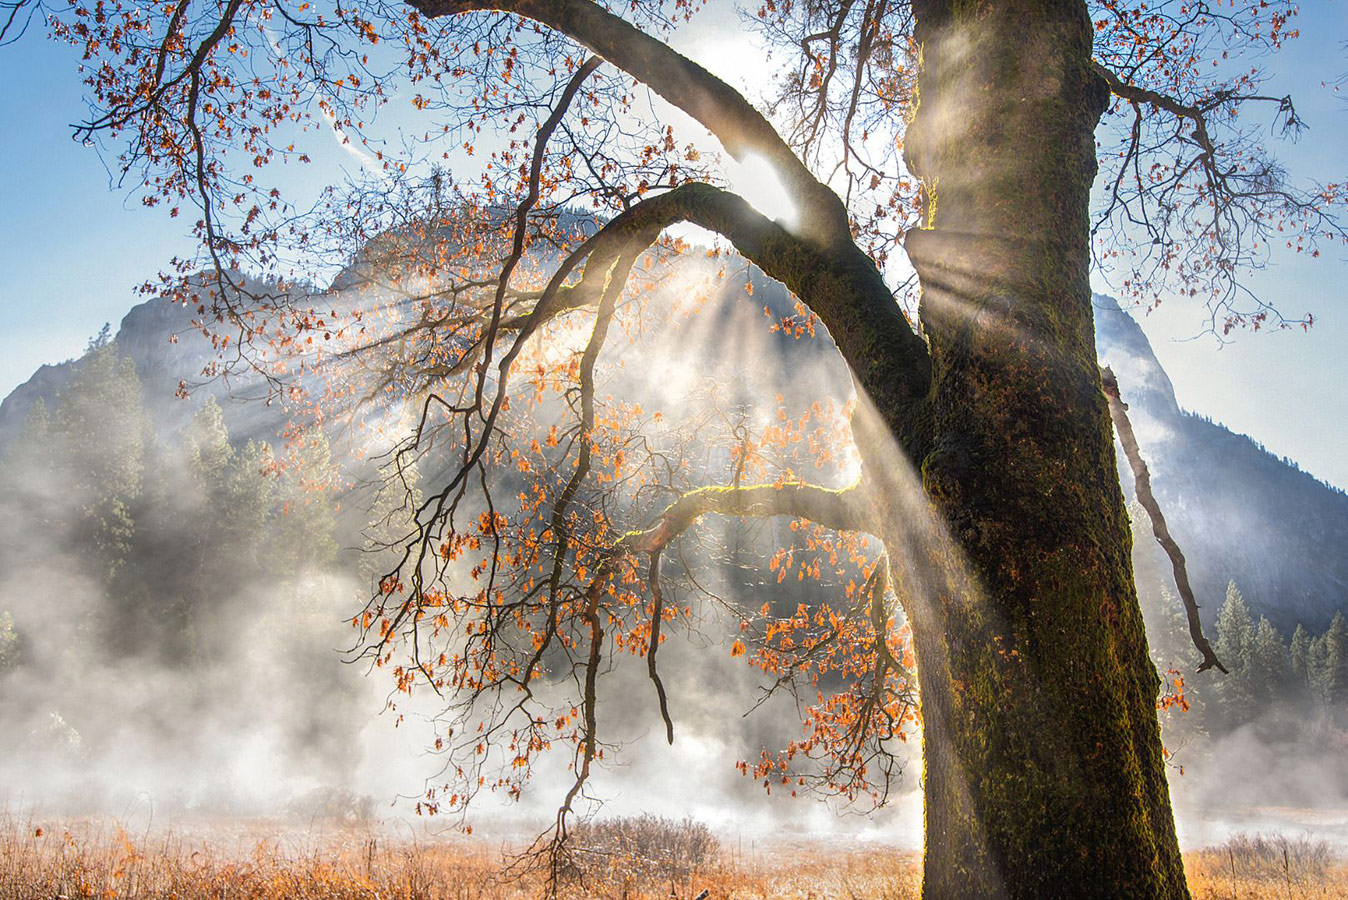 Волшебство, © Кевин Юберг, Фотоконкурс «Погодный фотограф года» — Weather Photographer of the Year